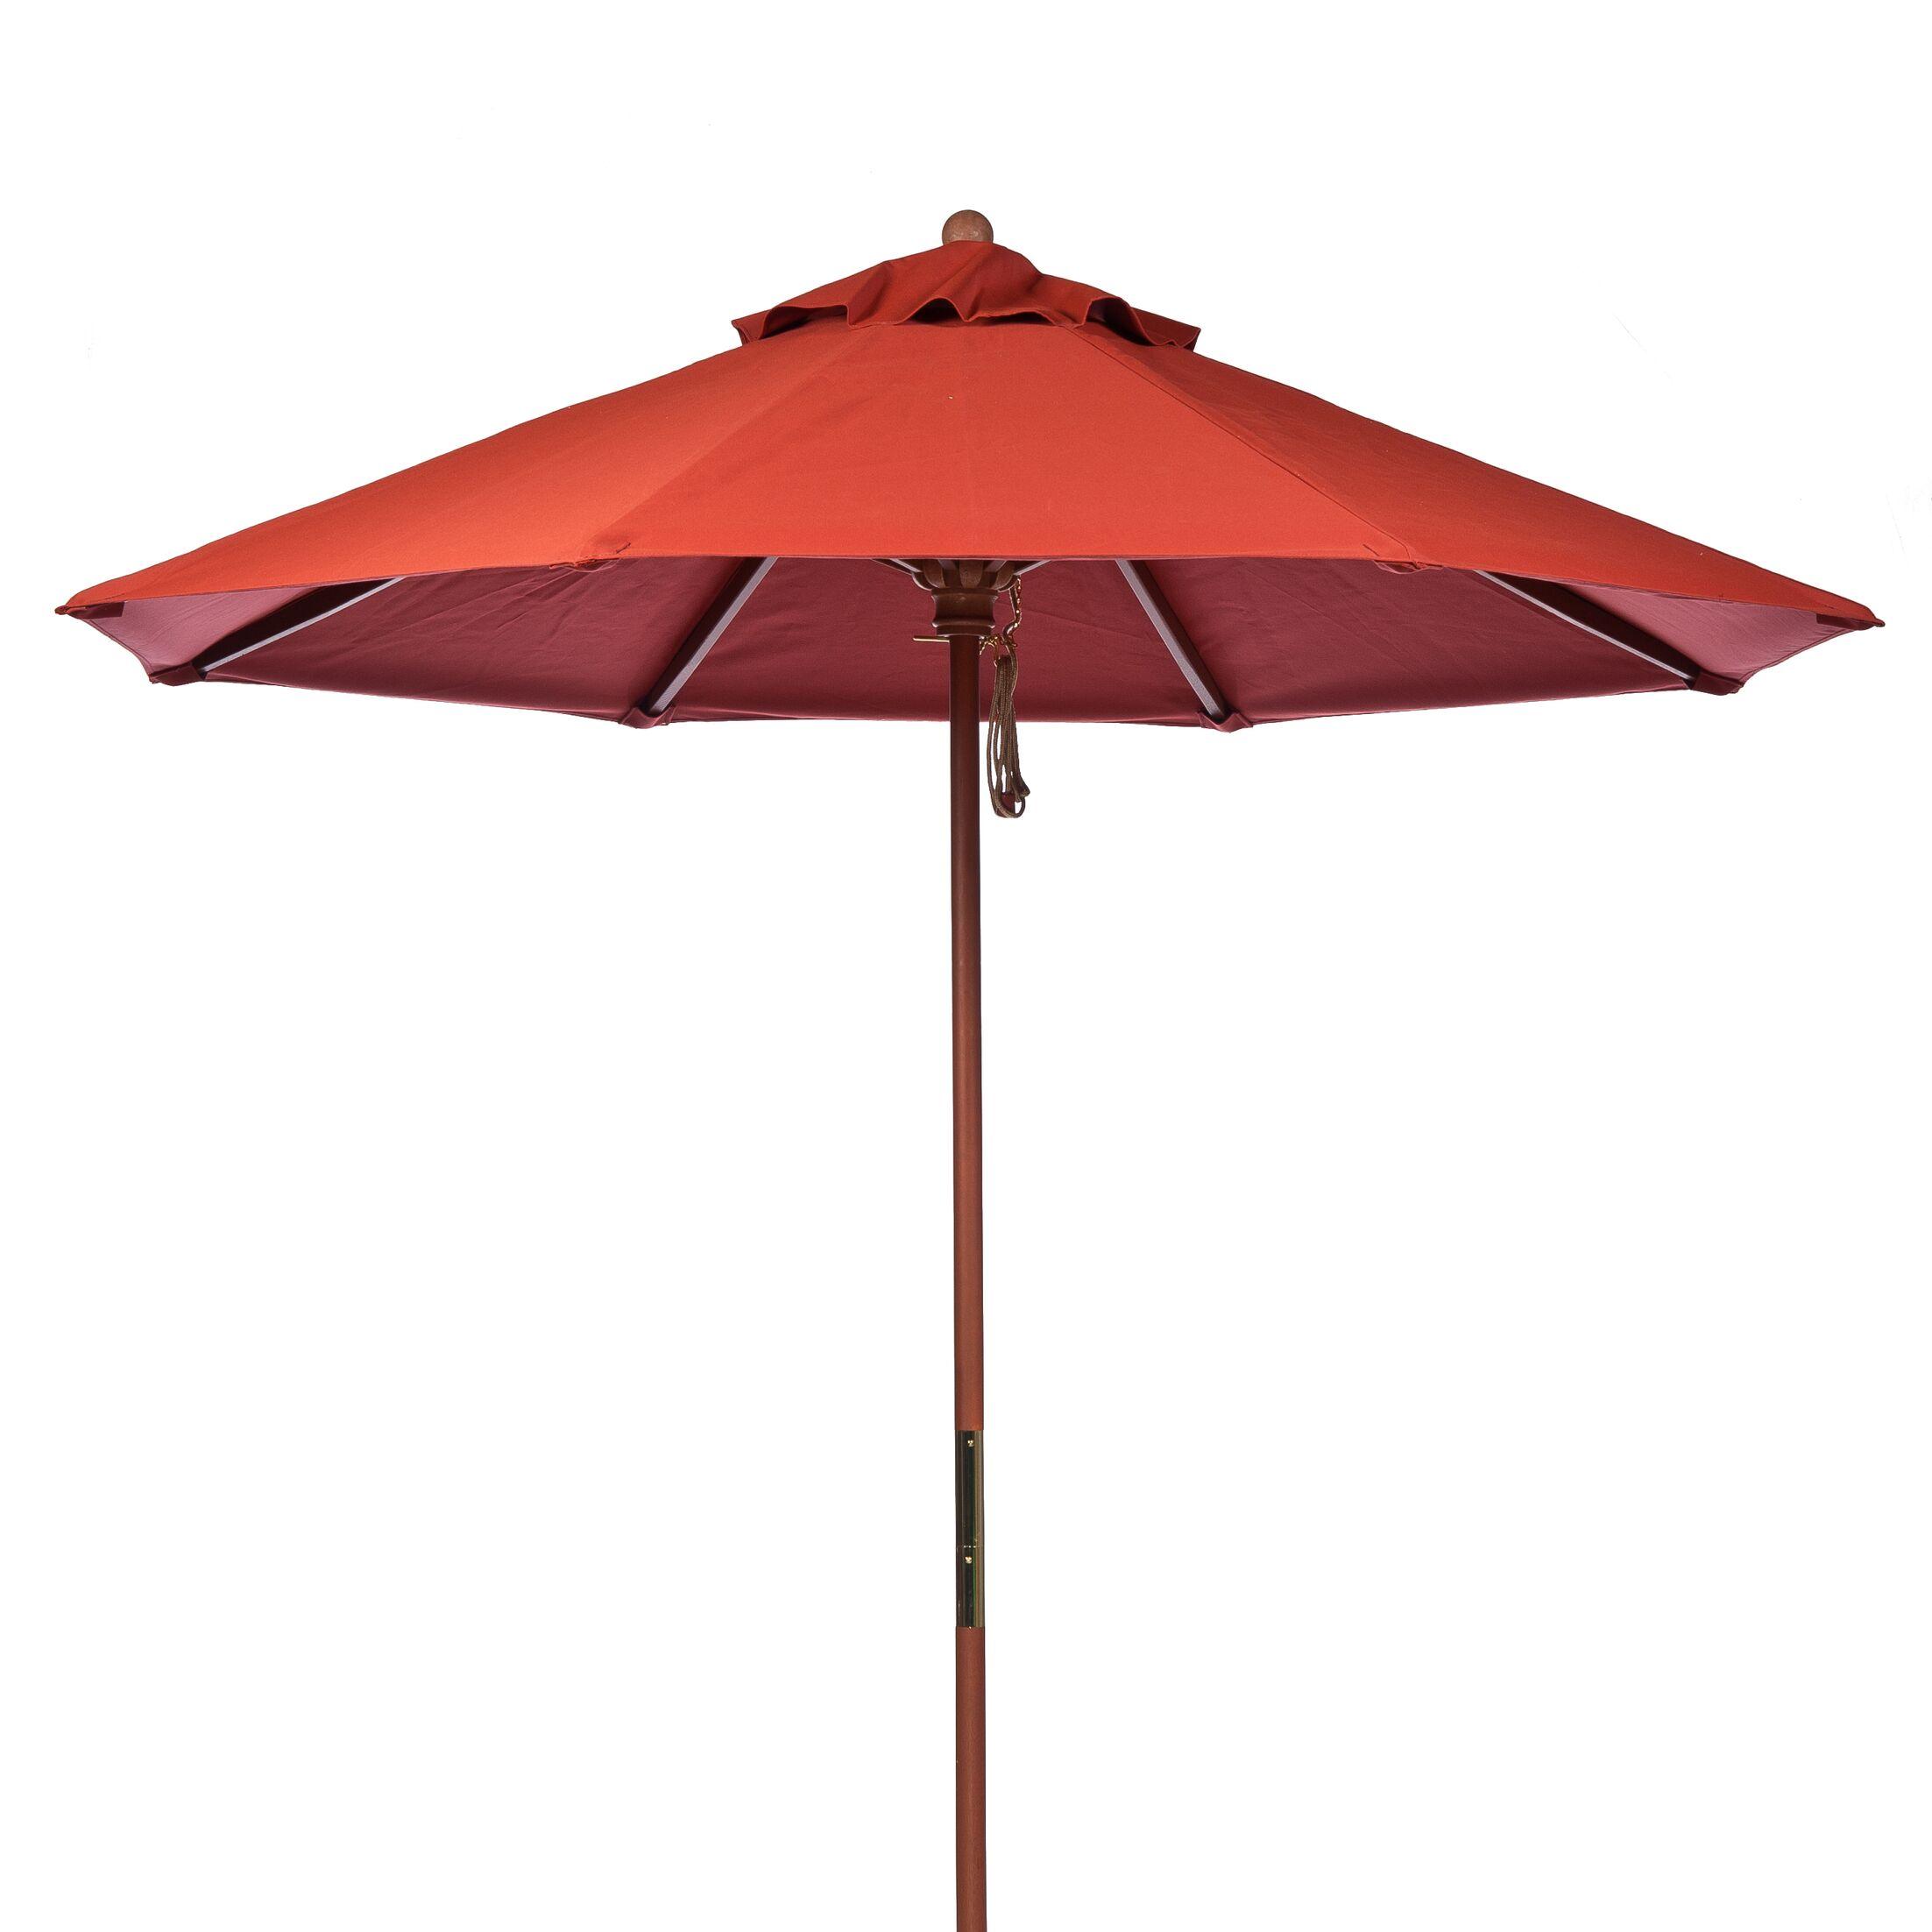 9' Market Umbrella Fabric: Terra Cotta